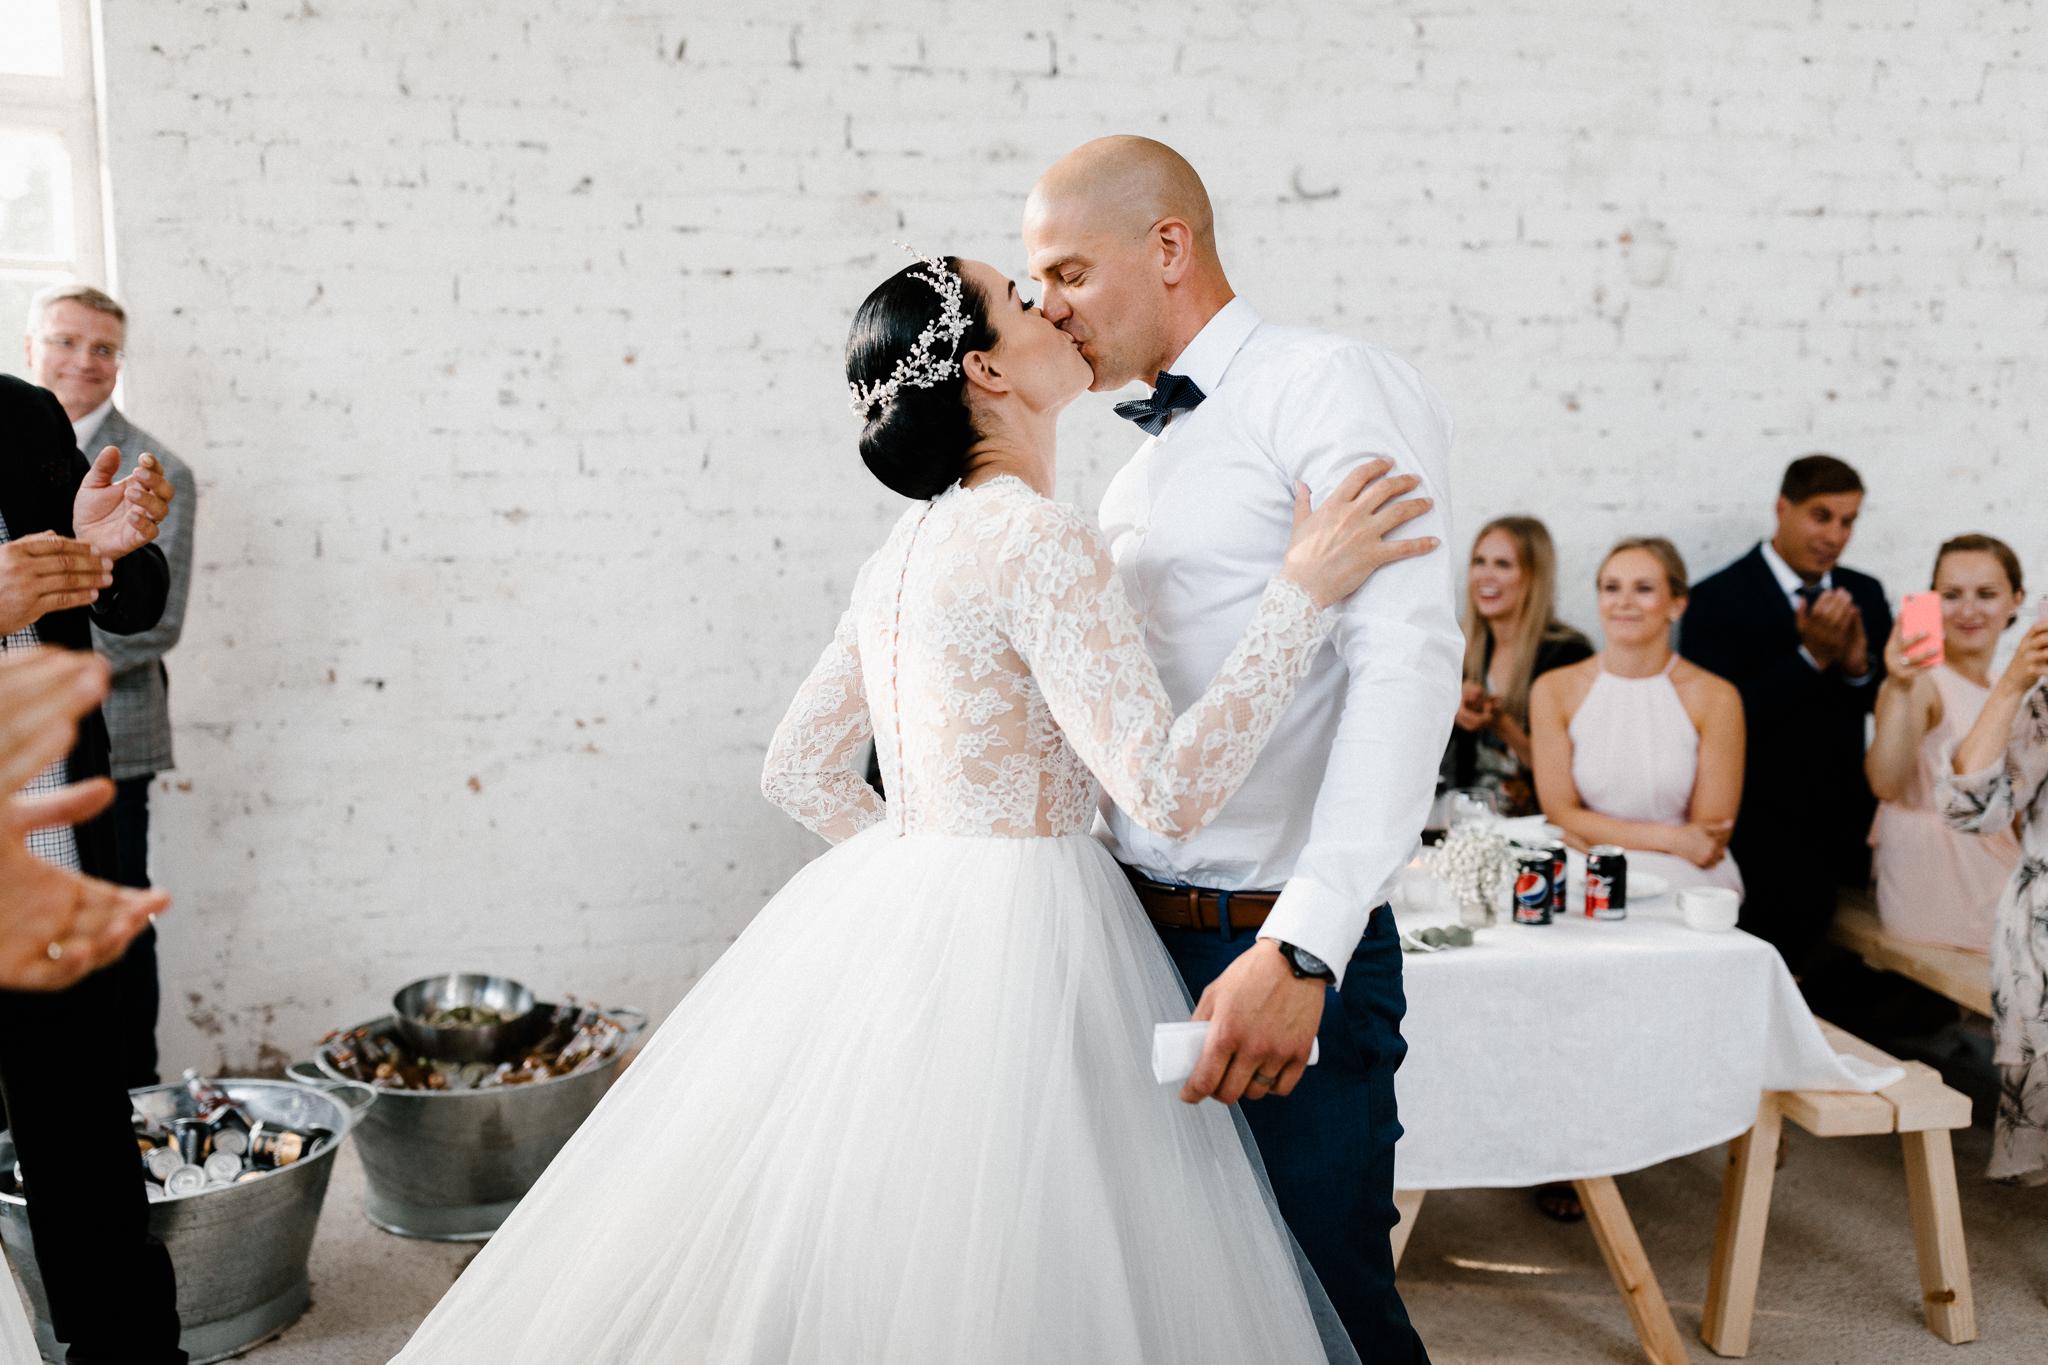 Essi + Ville   Oitbacka Gården   by Patrick Karkkolainen Wedding Photography-281.jpg